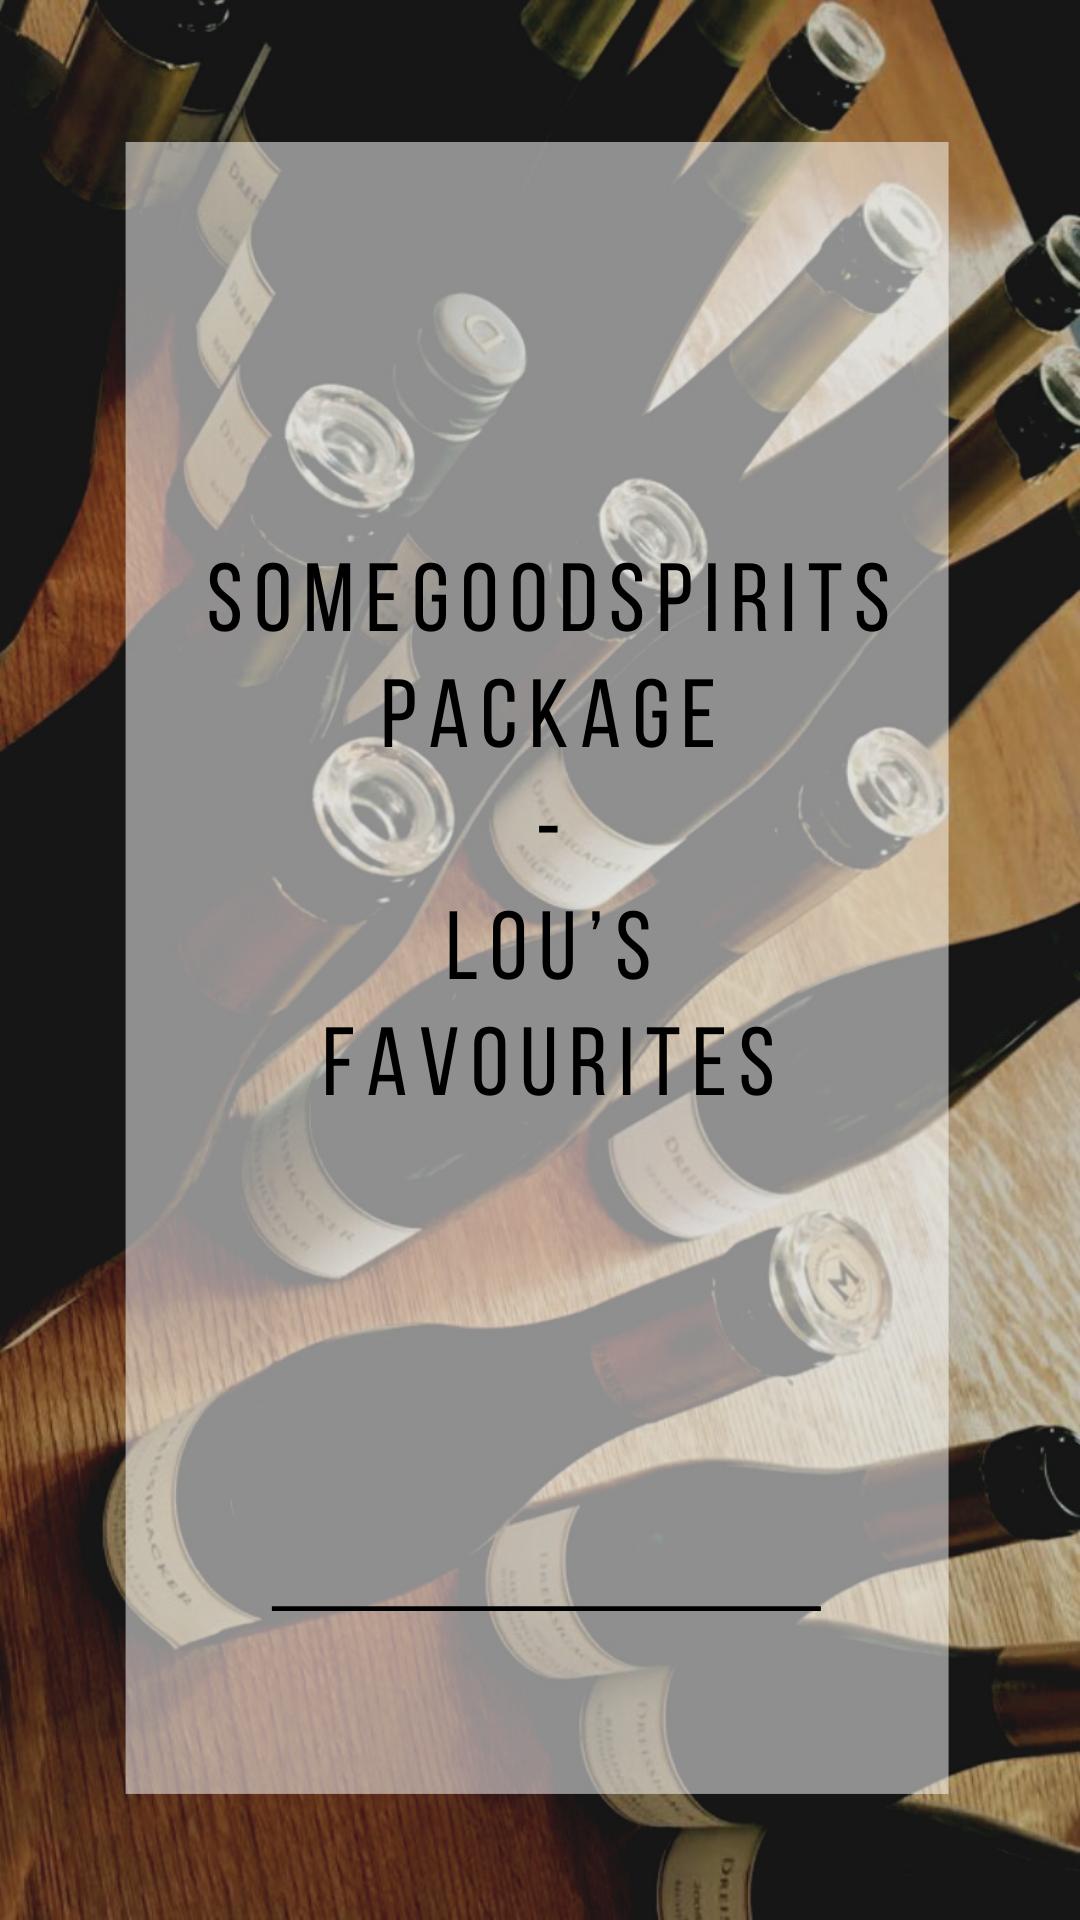 Somegoodspirits Package